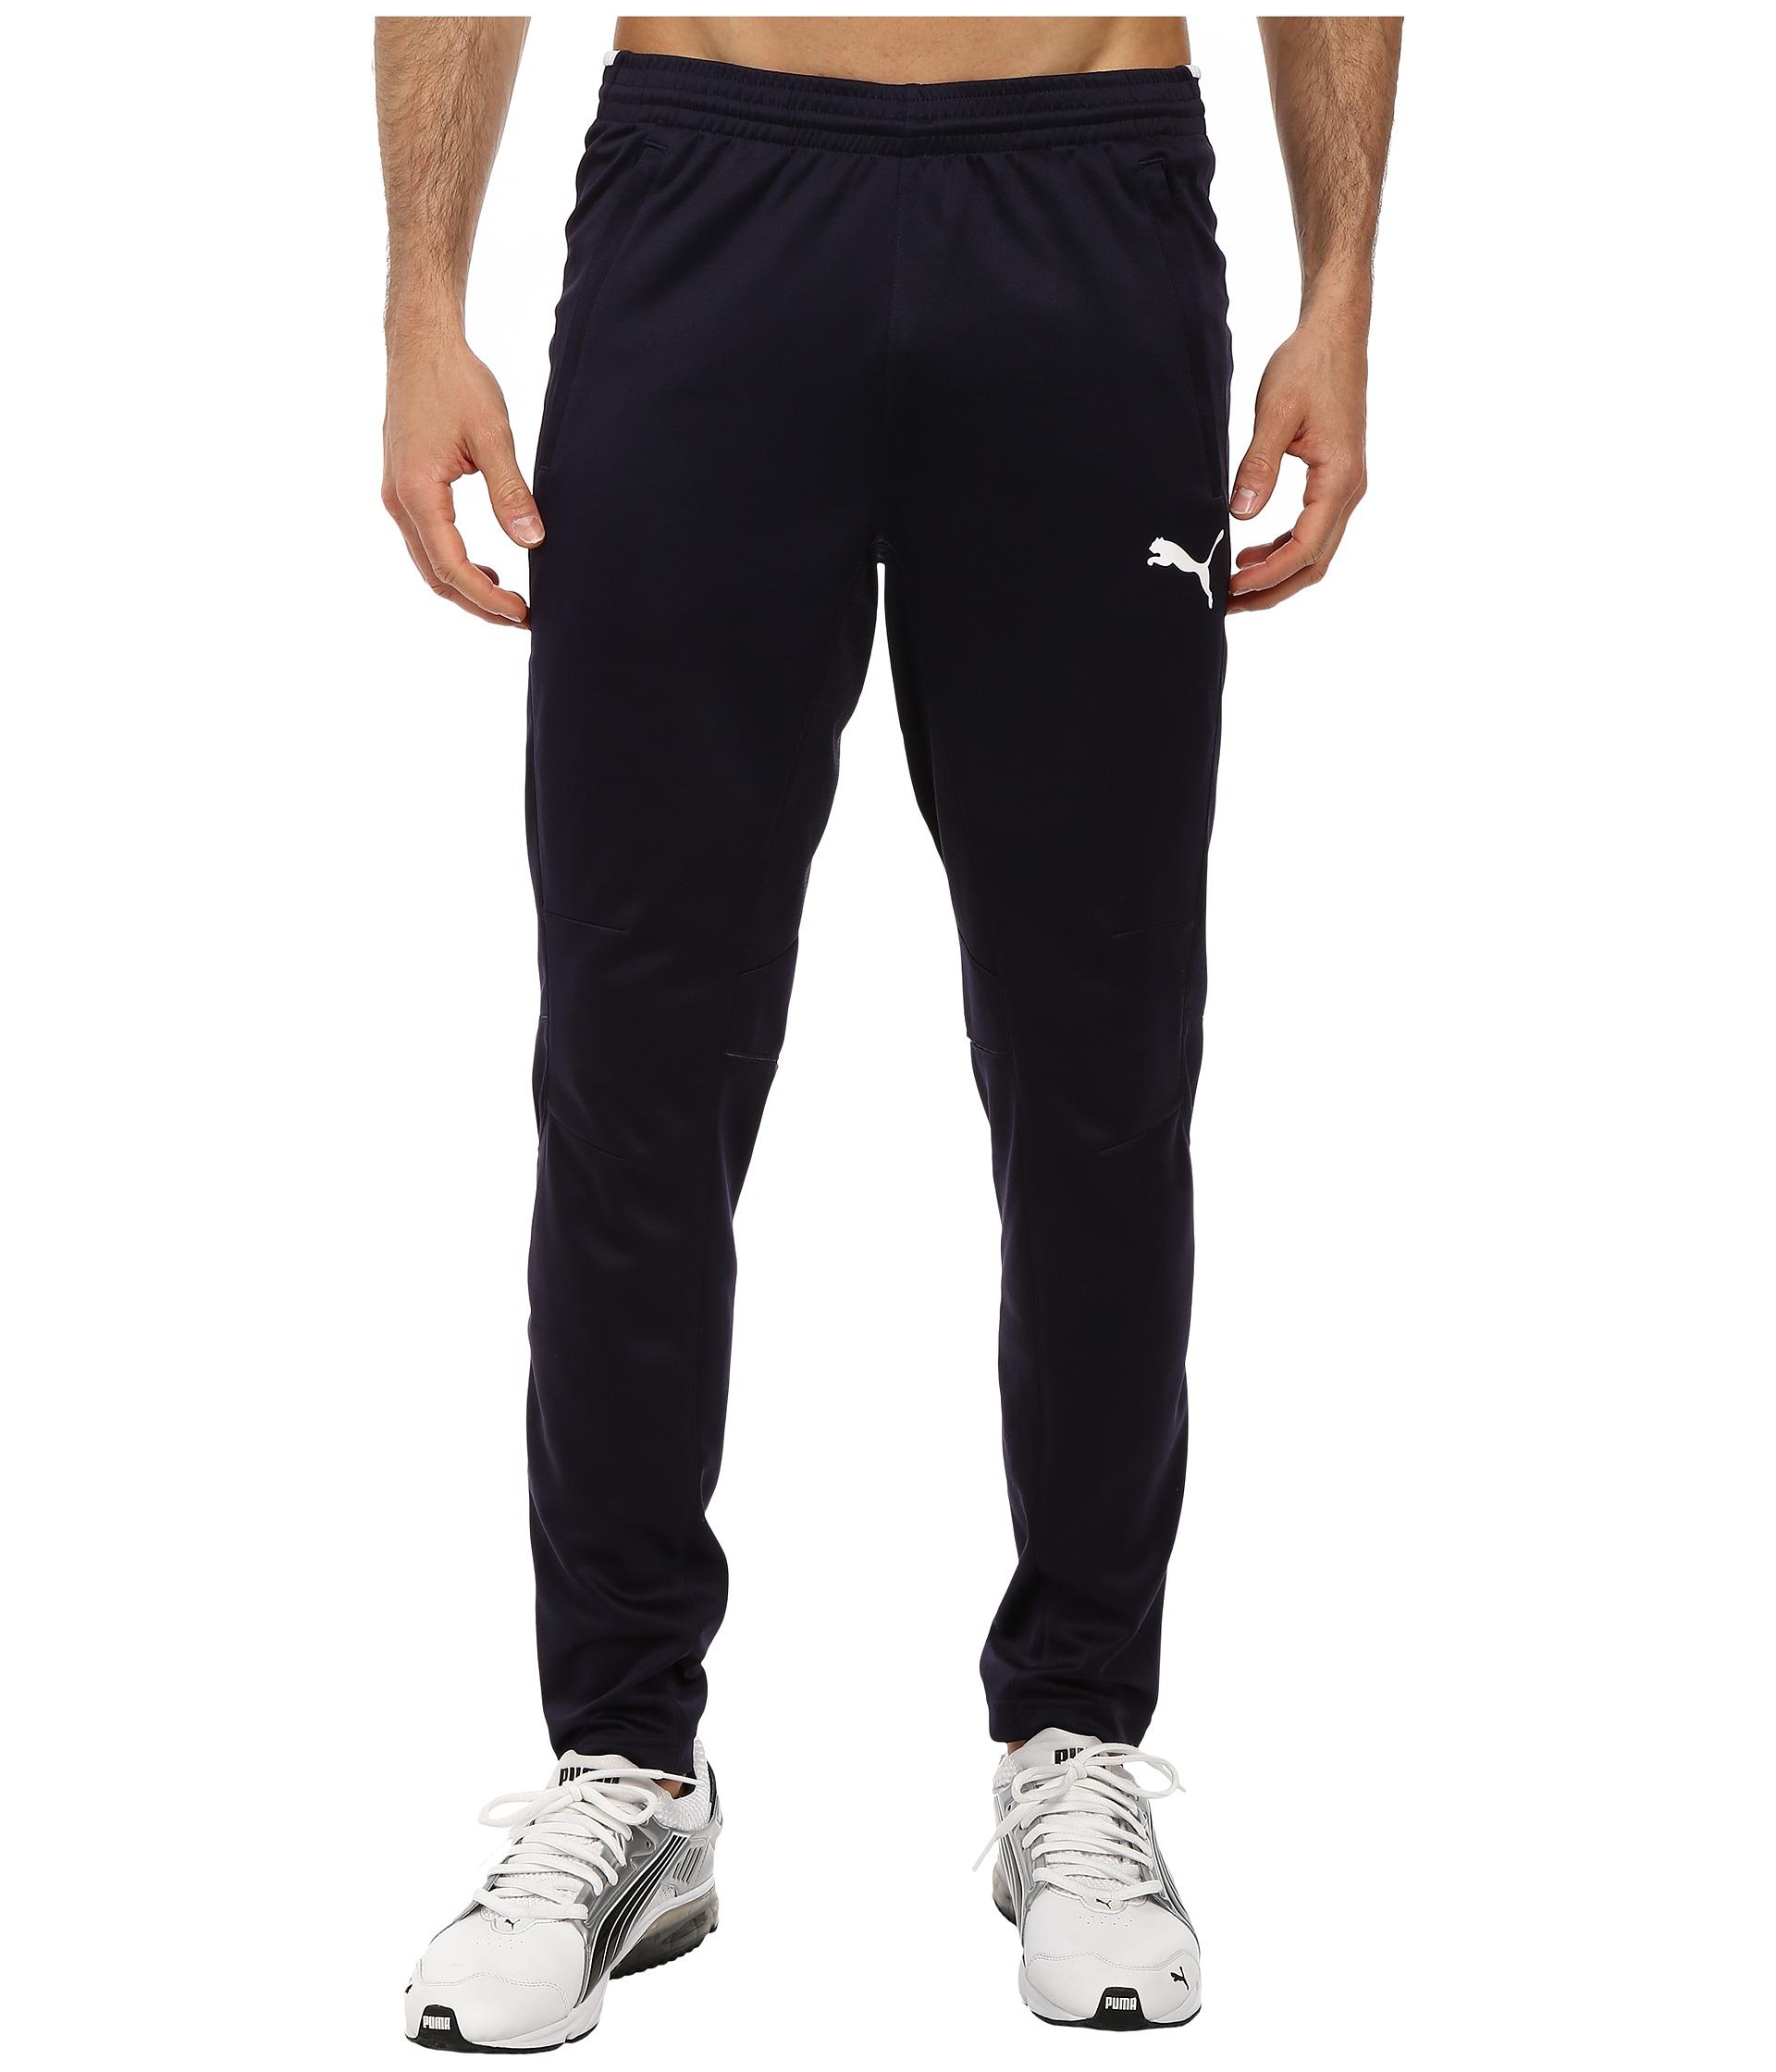 cheap puma pants mens cheap   OFF49% Discounted 297f279be57e0